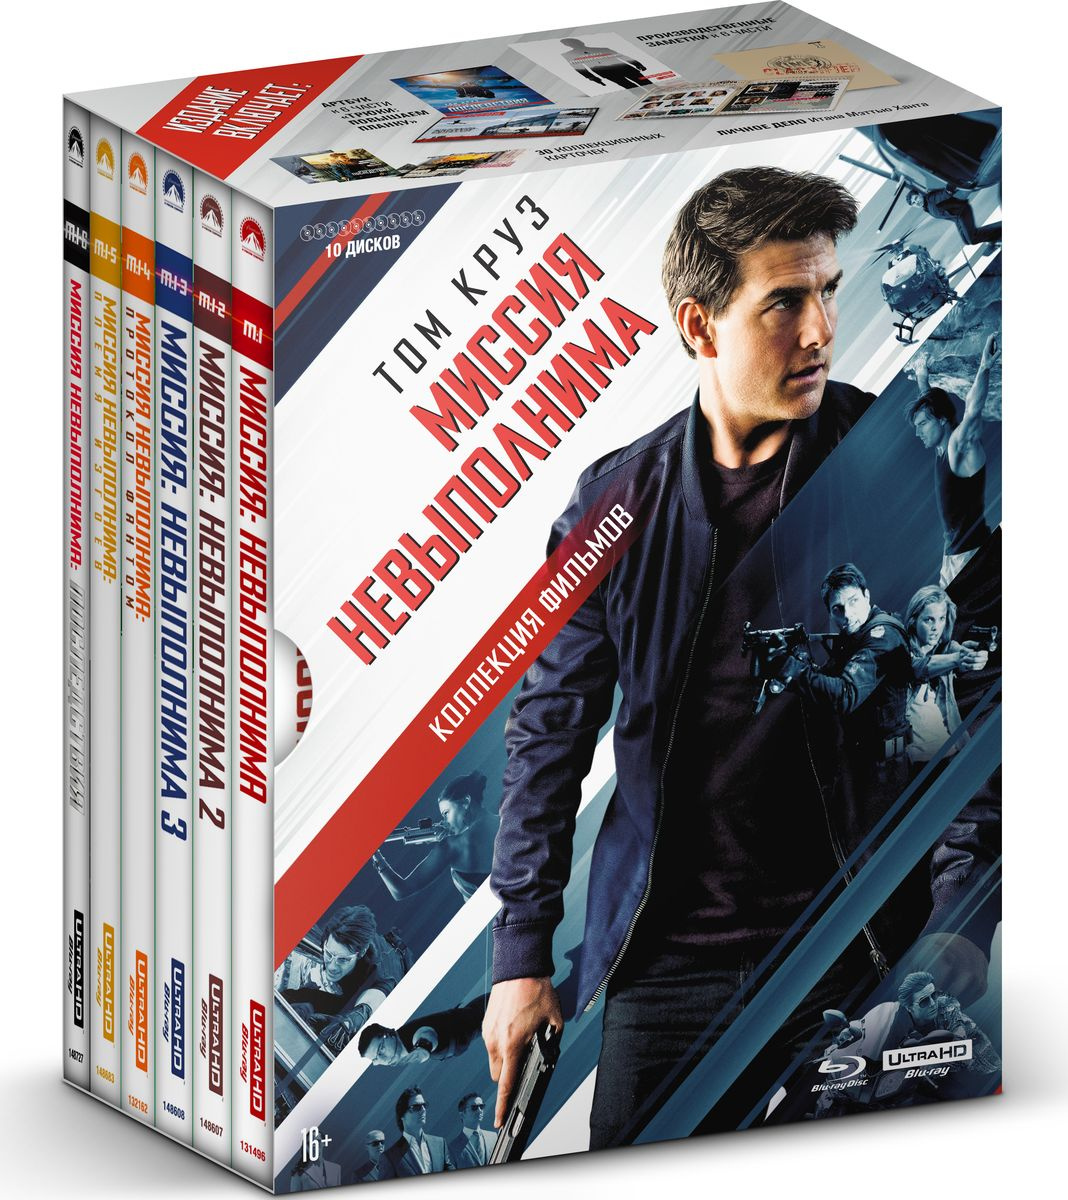 Миссия невыполнима. Коллекция (4K UHD Blu-ray + 10 Blu-ray) #1